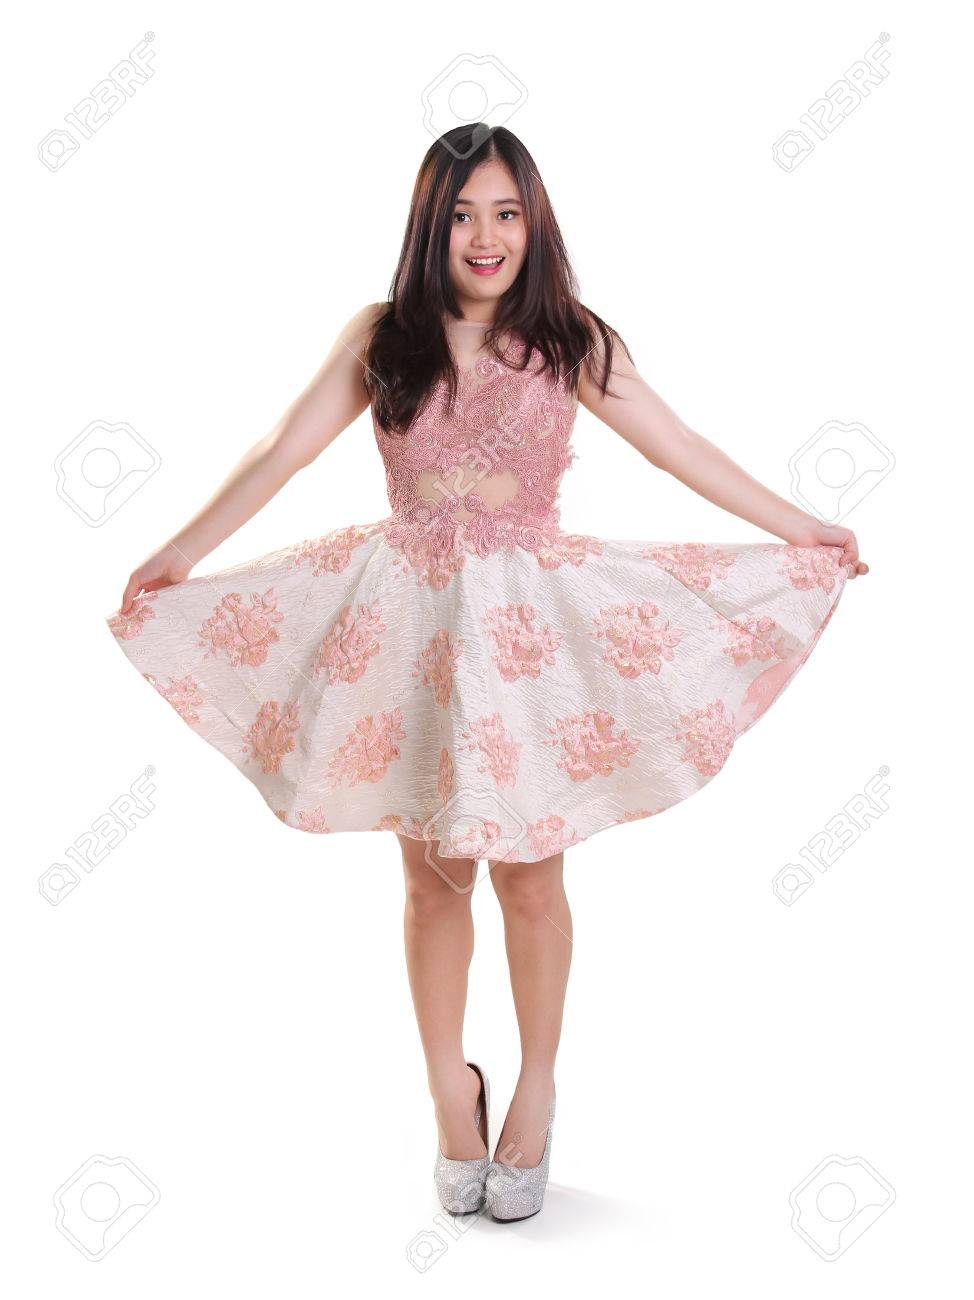 252e2bd935 Lifting Skirt Stock Photos And Images - 123RF